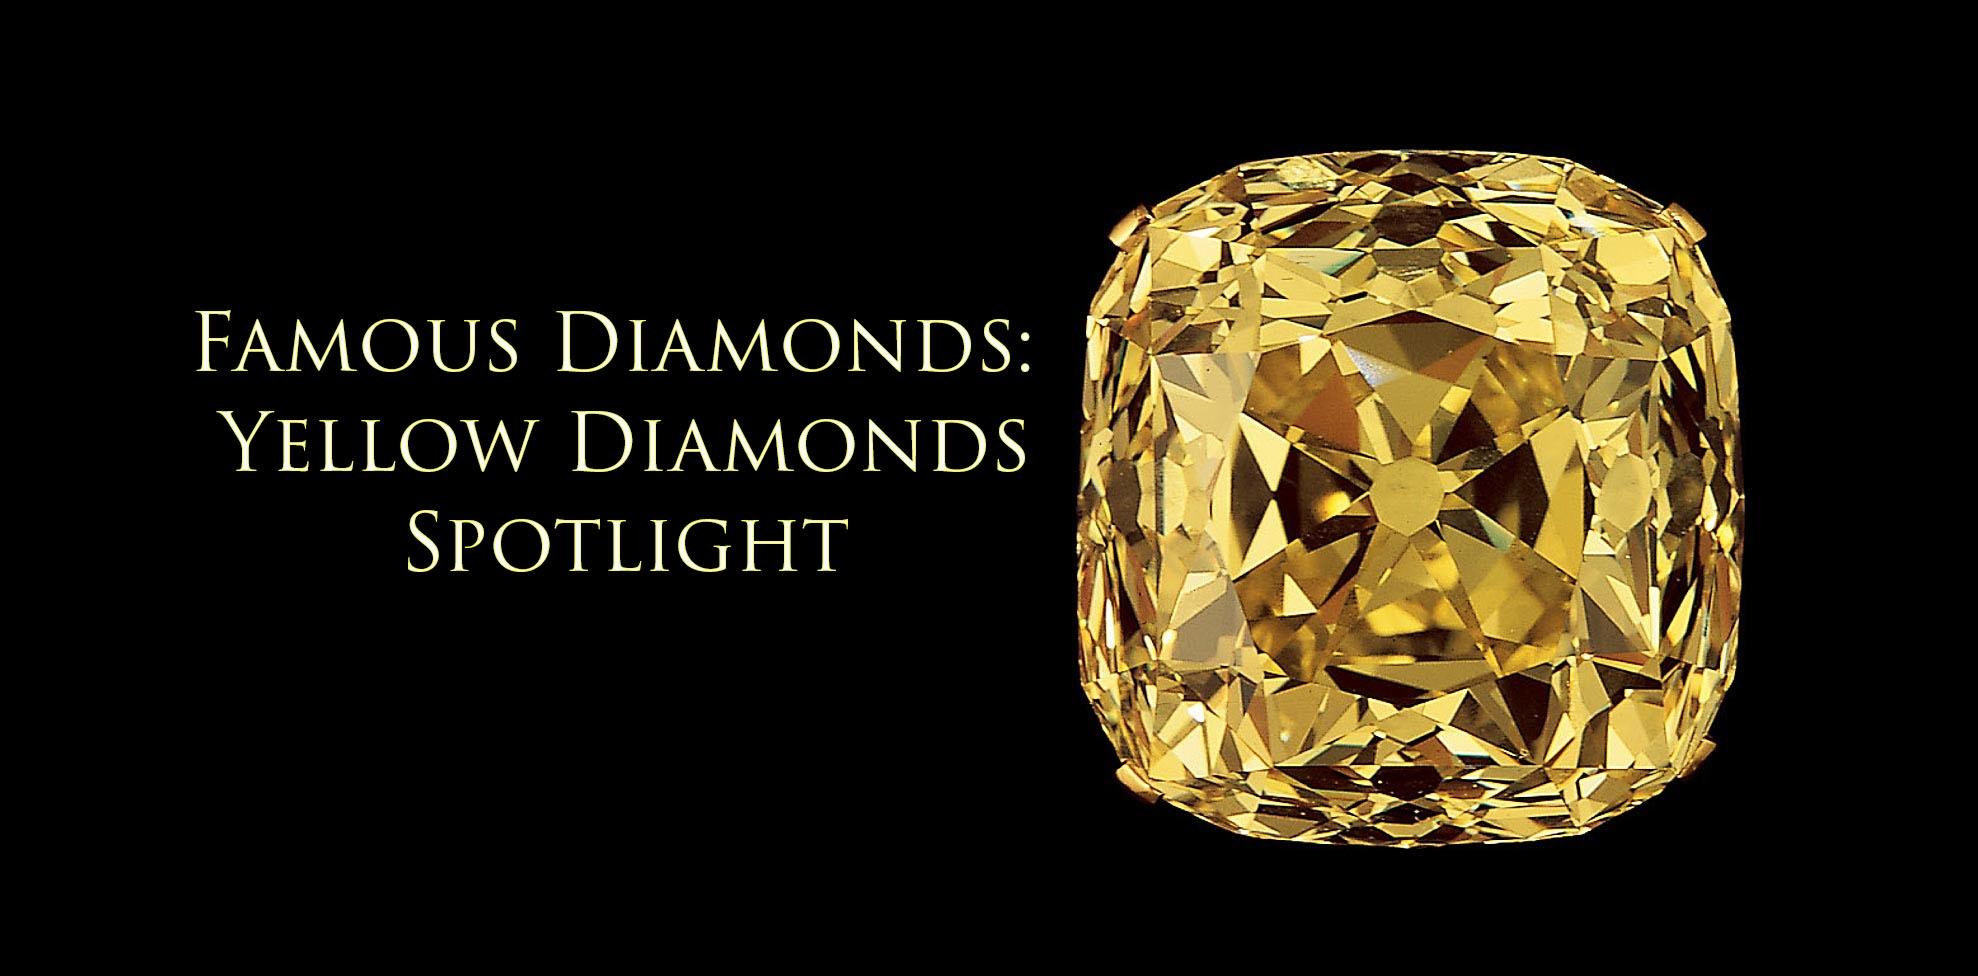 yellow_diamonds_spotlight.jpg